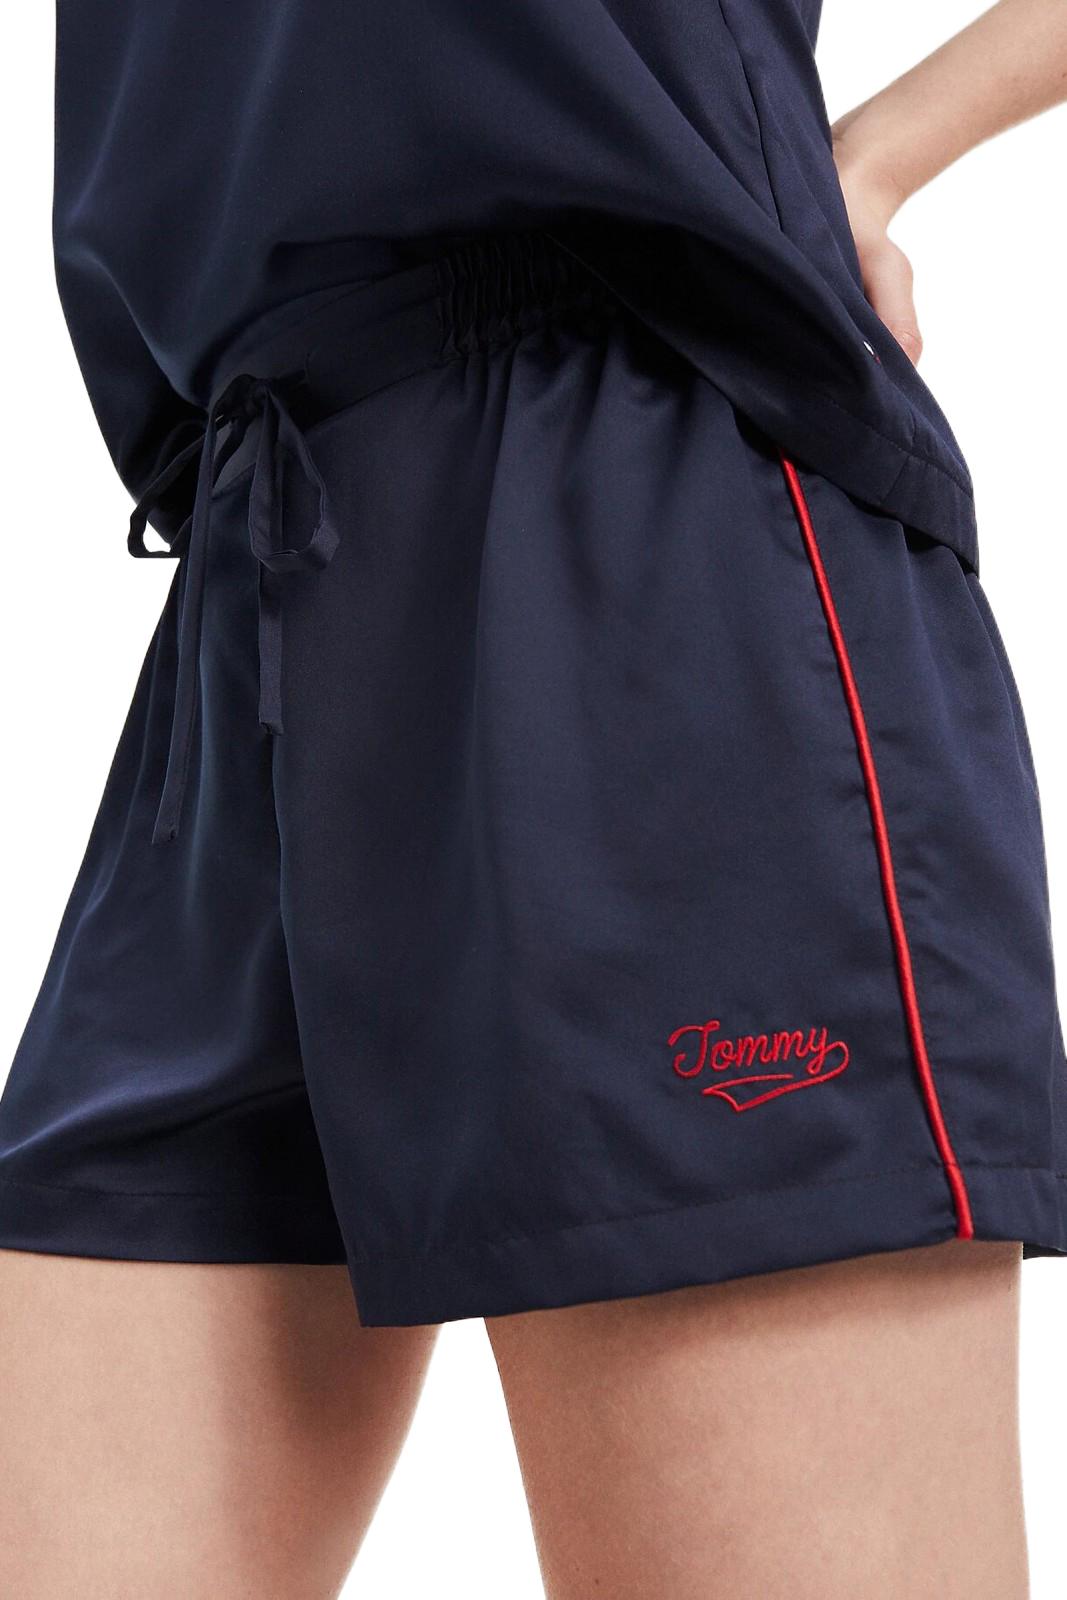 Tommy Hilfiger niebieskie piżama Short